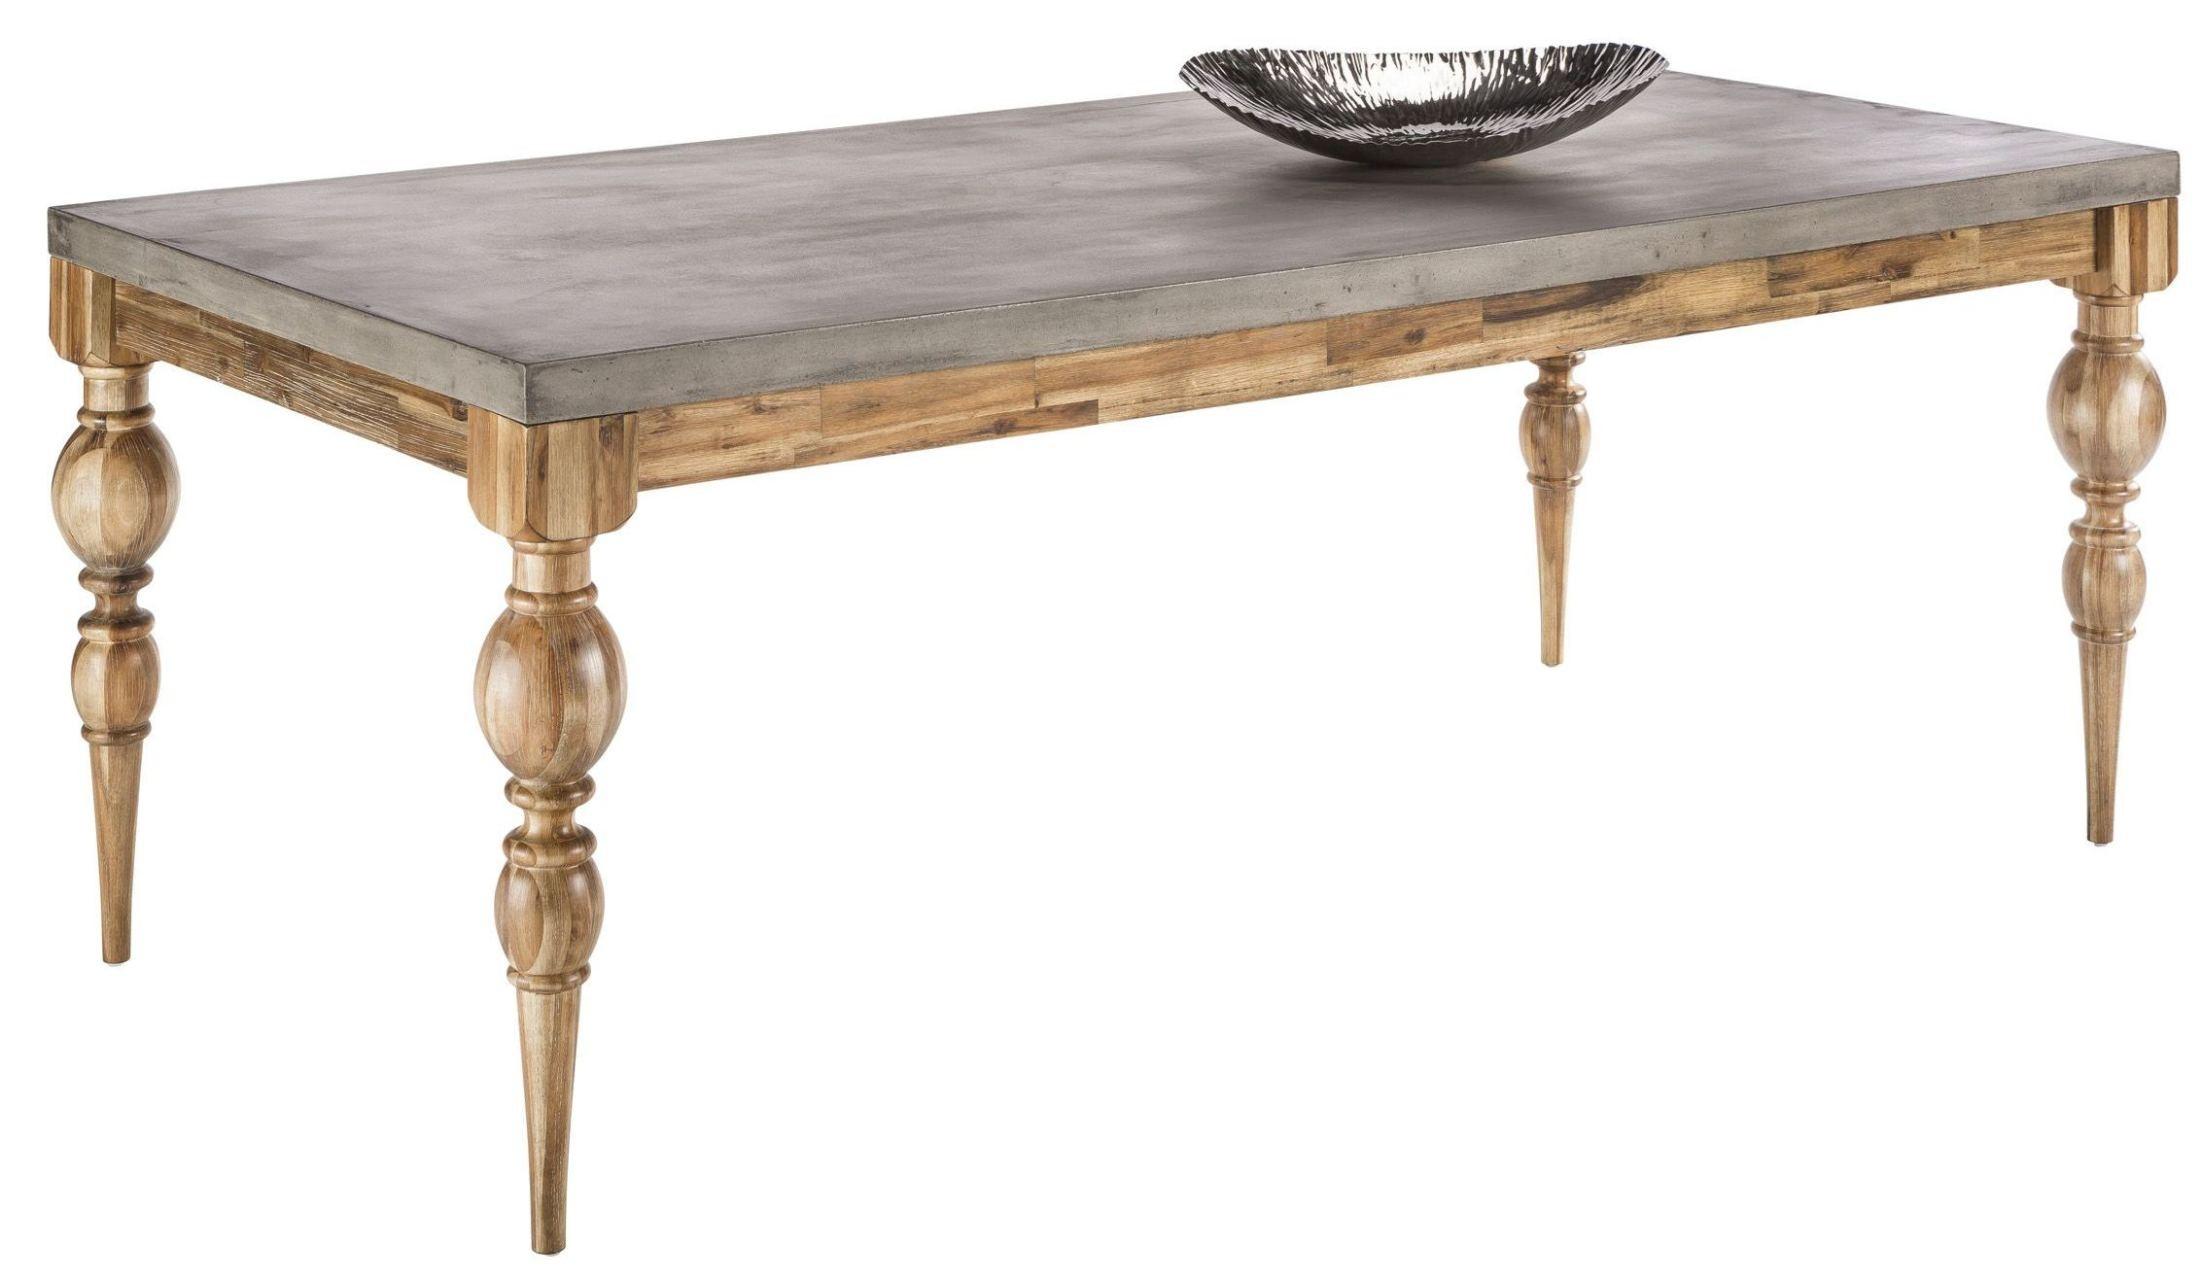 Louis Golden Distressed Rectangular Dining Table 100779 Sunpan Modern Home